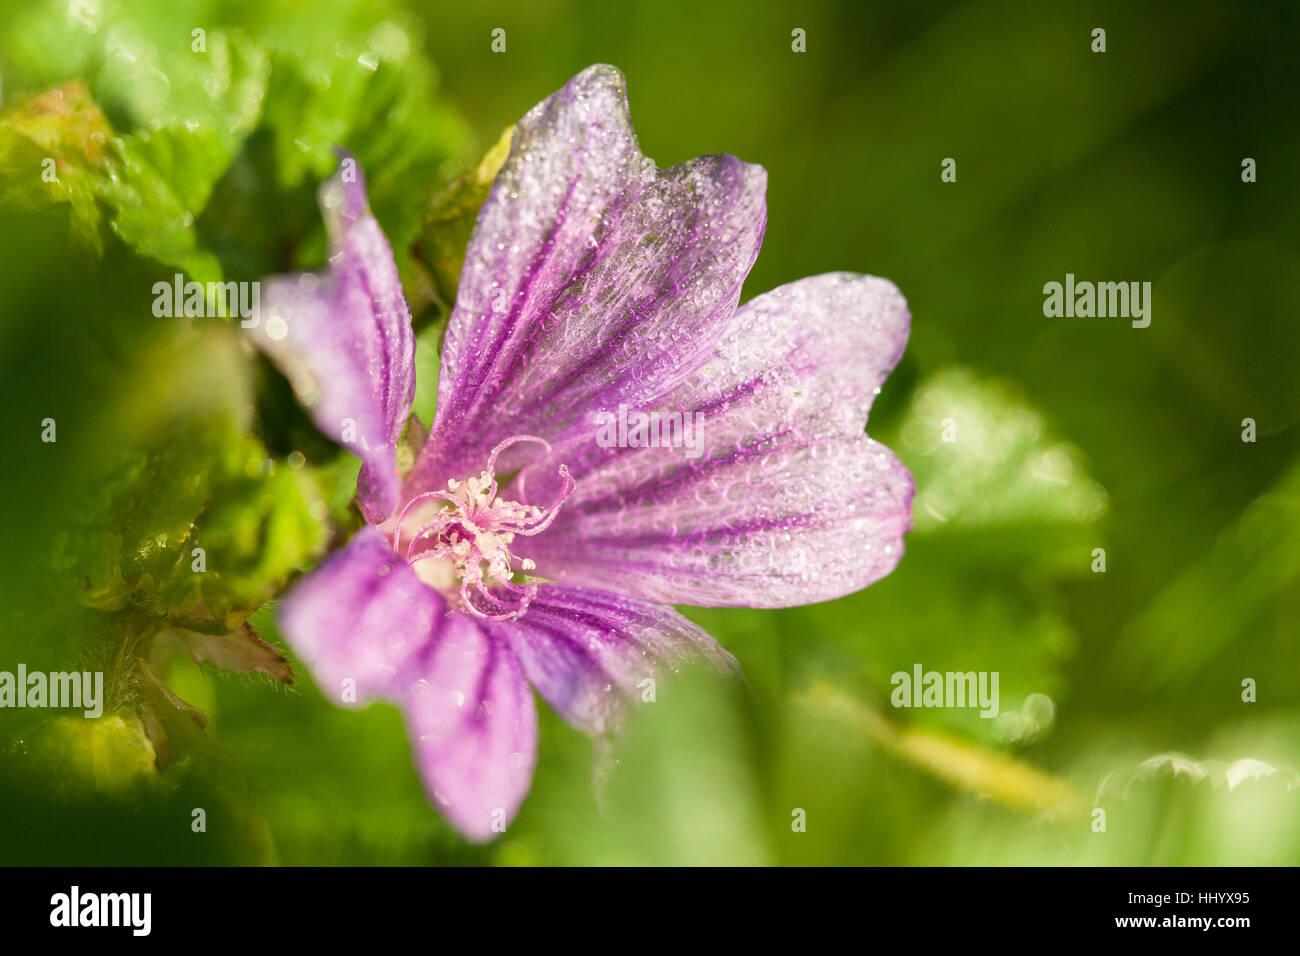 wild, purple, mallow, medicinal plant, plant, nature, macro, close-up, macro Stock Photo